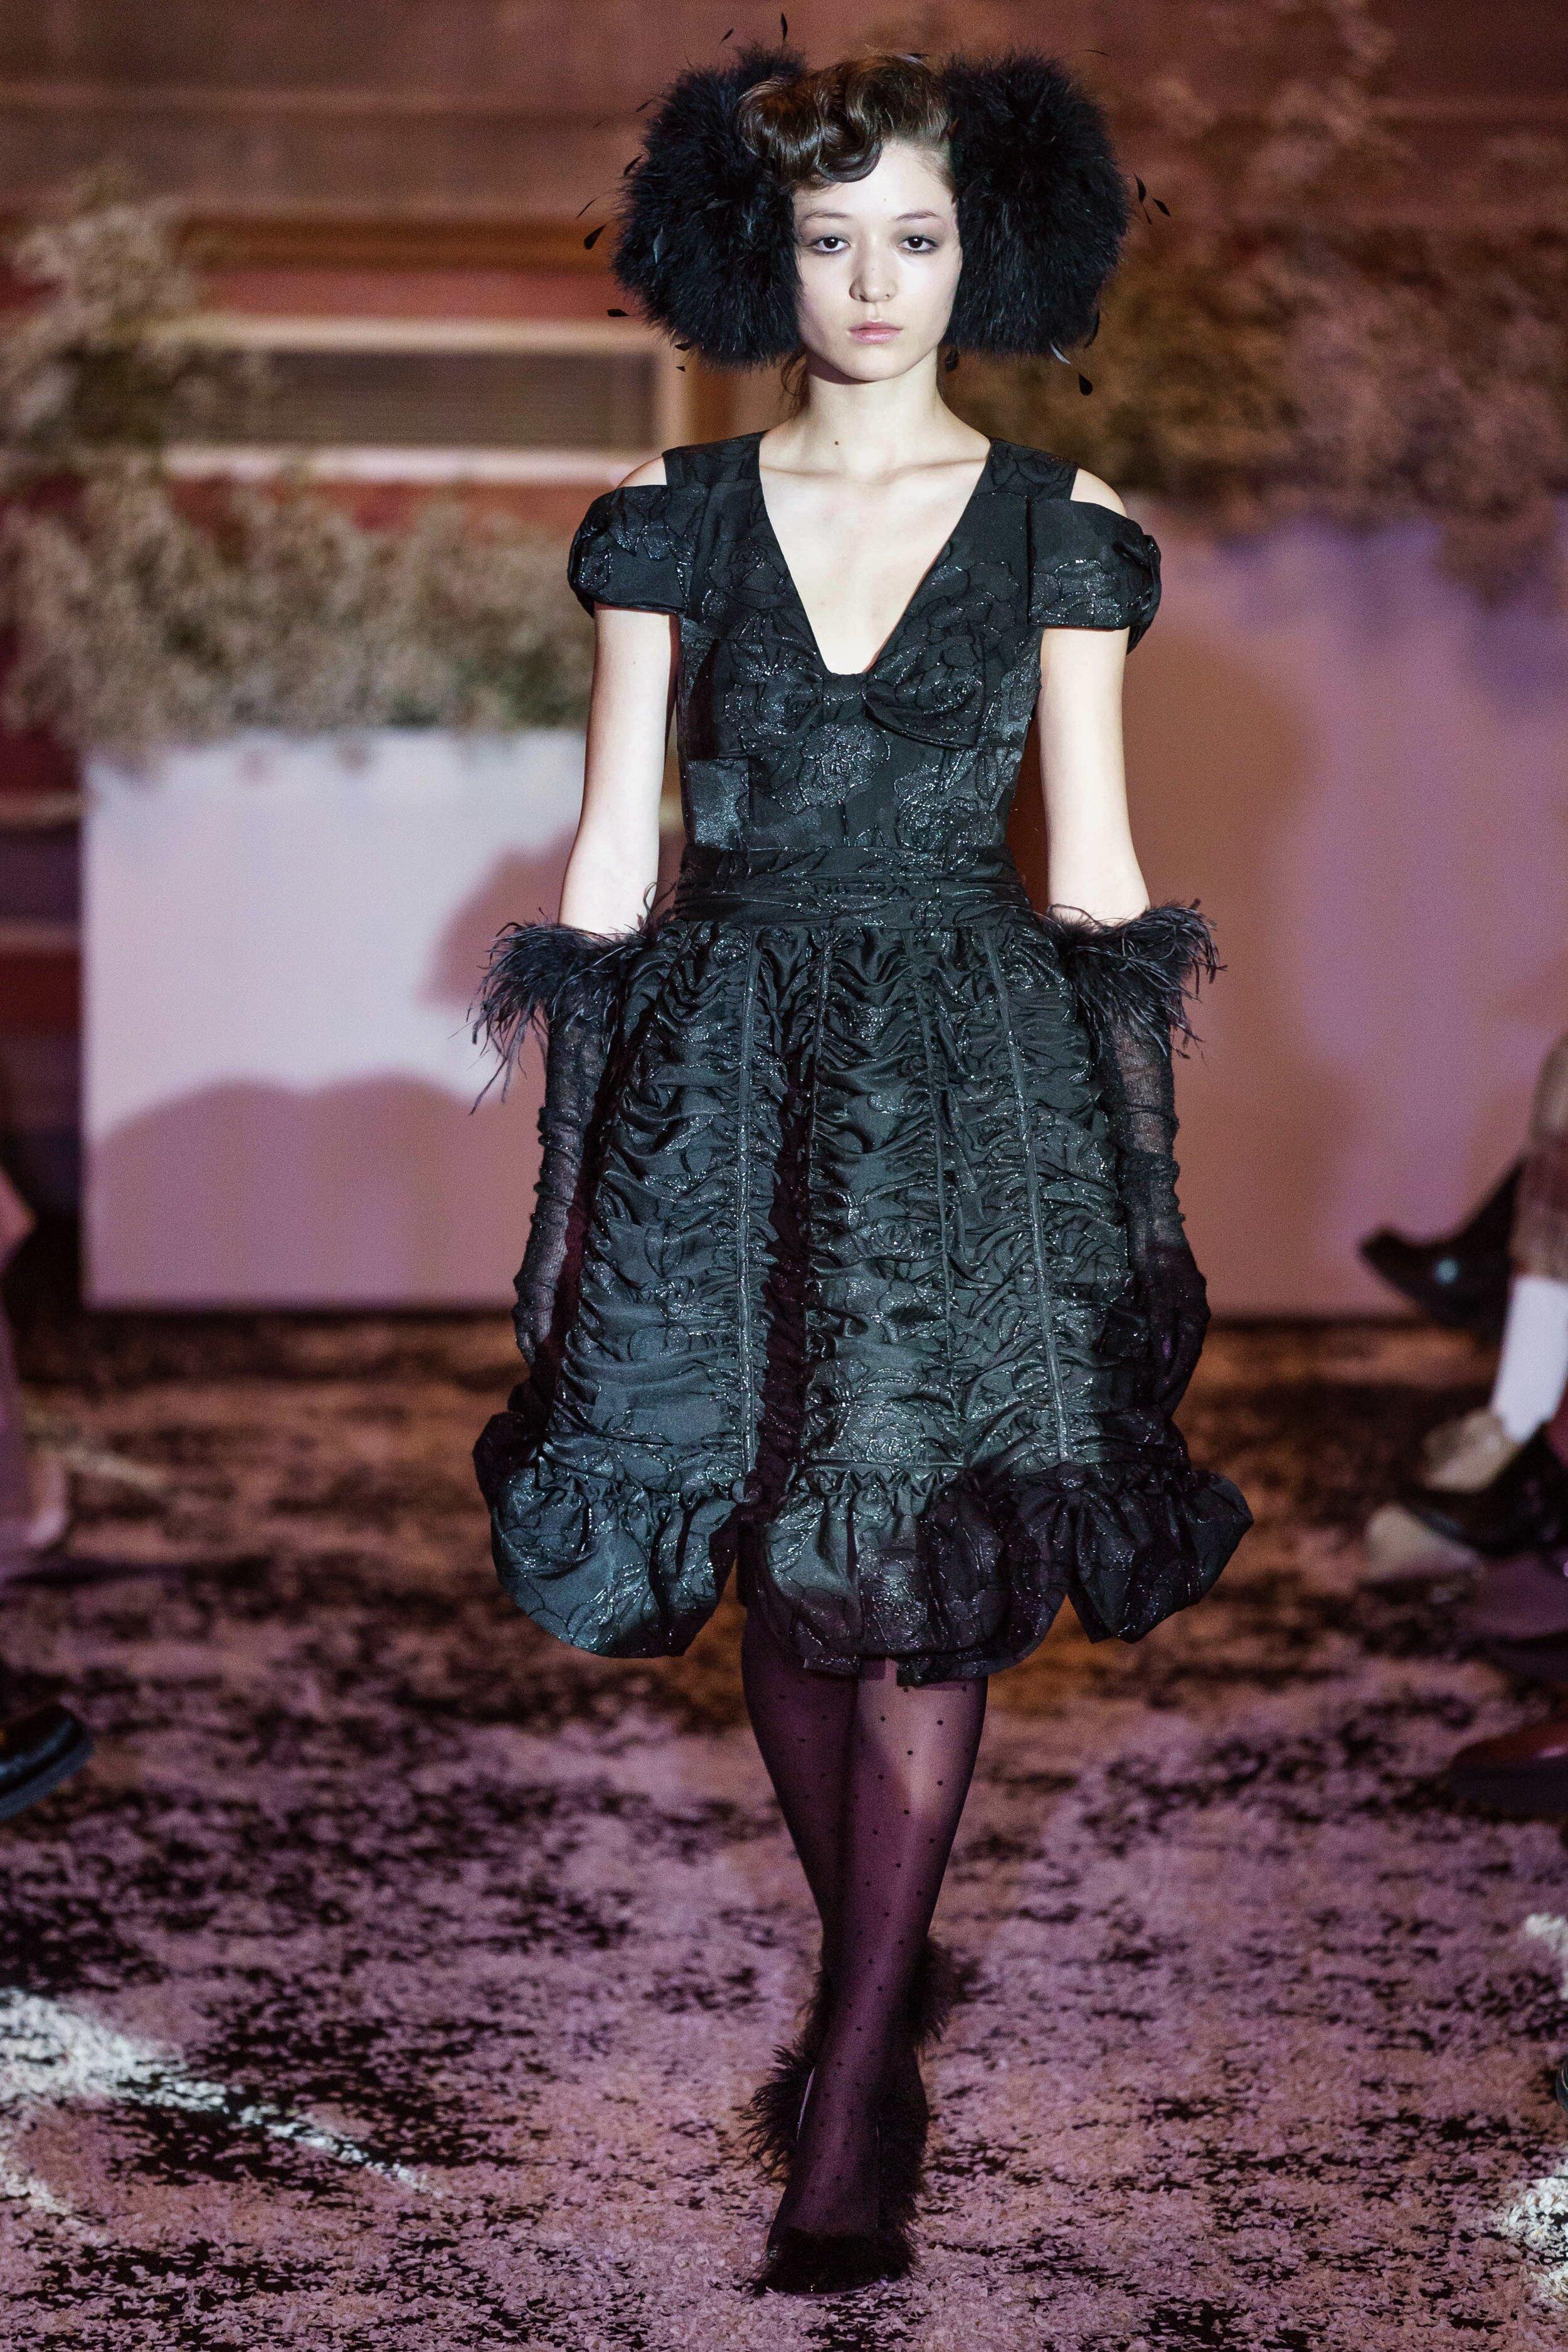 Image Credit - Vogue Runway